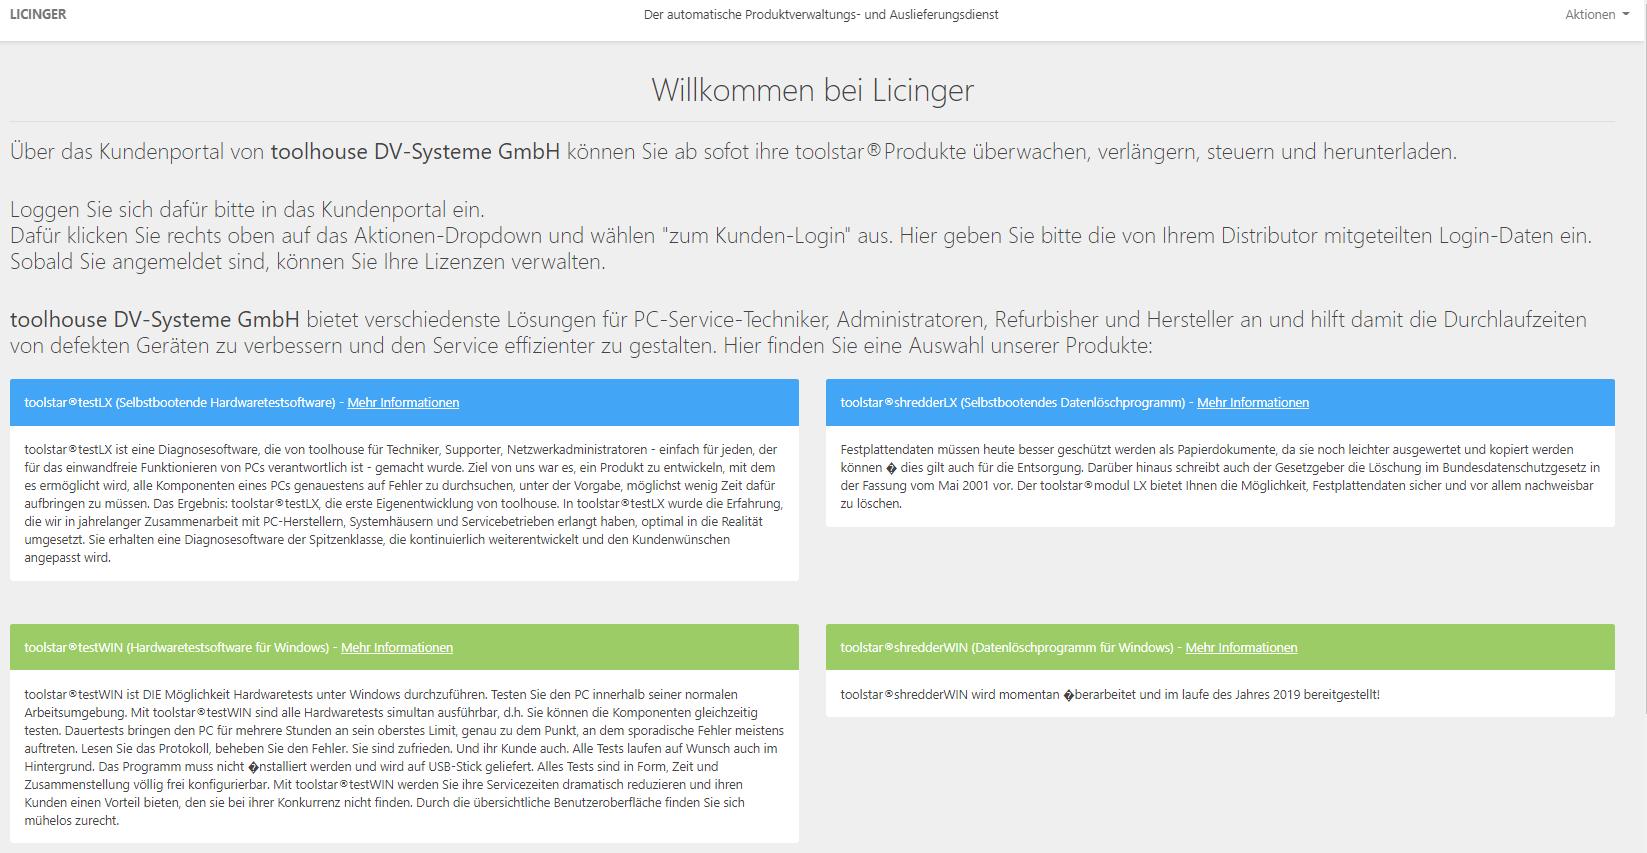 Kundenportal Licinger Startseite